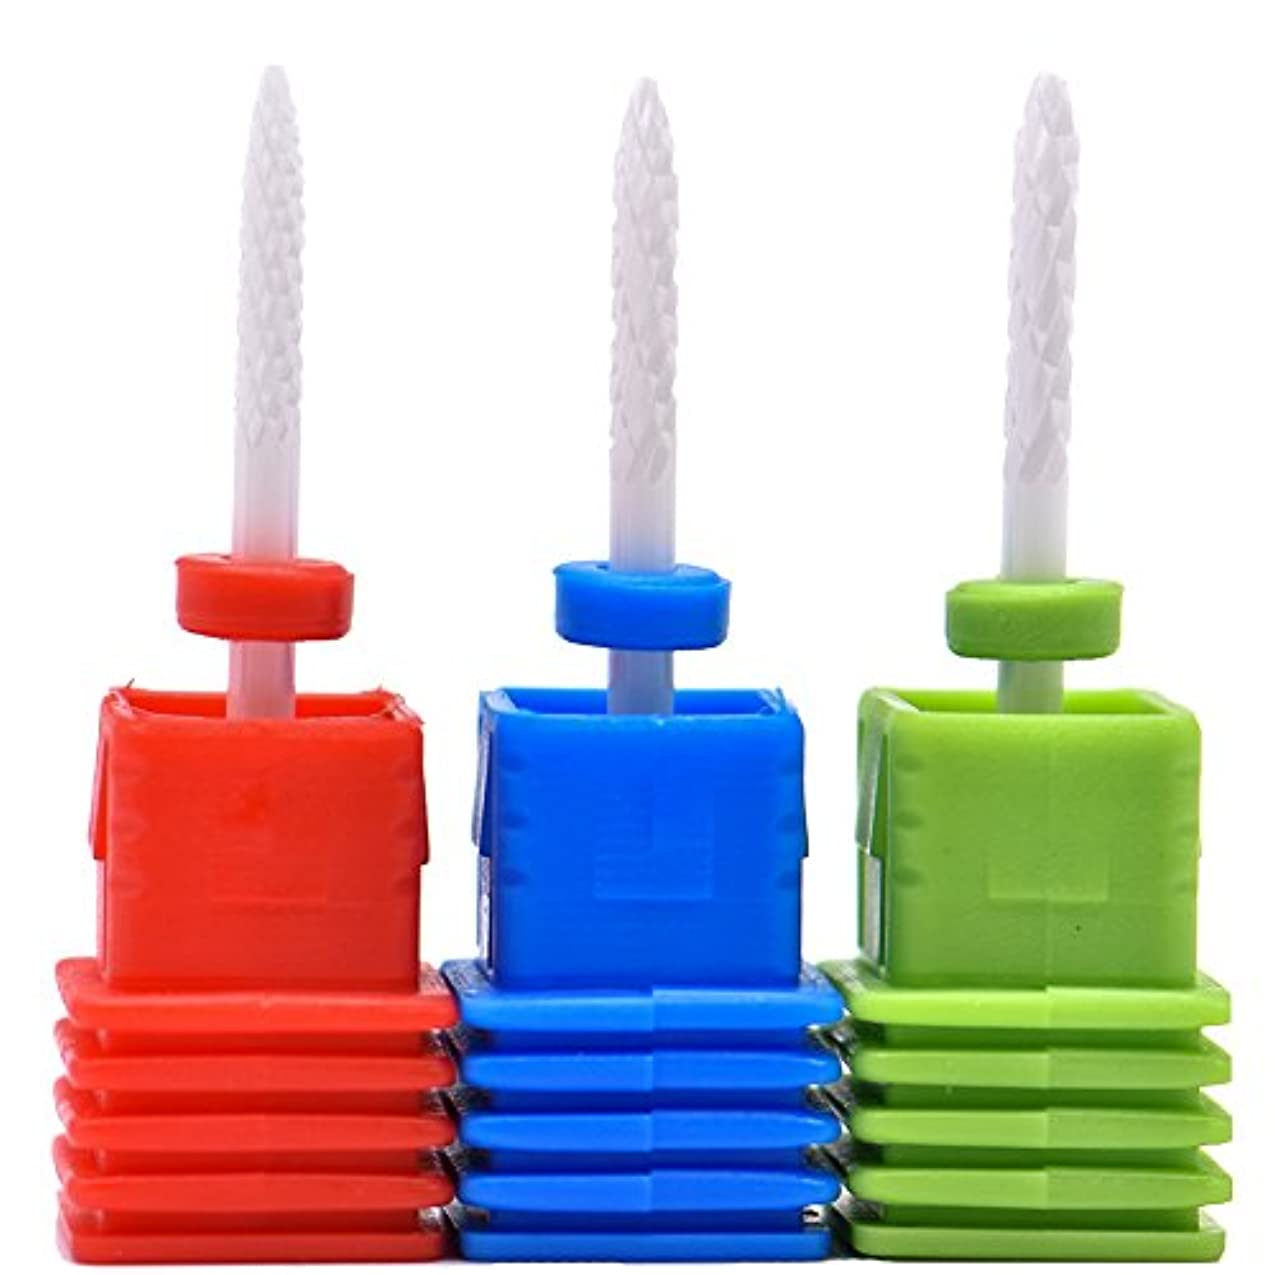 Oral Dentistry ネイルアート ドリルビット 細かい 研削ヘッド 研磨ヘッド ネイル グラインド ヘッド 爪 磨き 研磨 研削 セラミック 全3色 (レッドF(微研削)+ブルーM(中仕上げ)+グリーンC(粗研削))